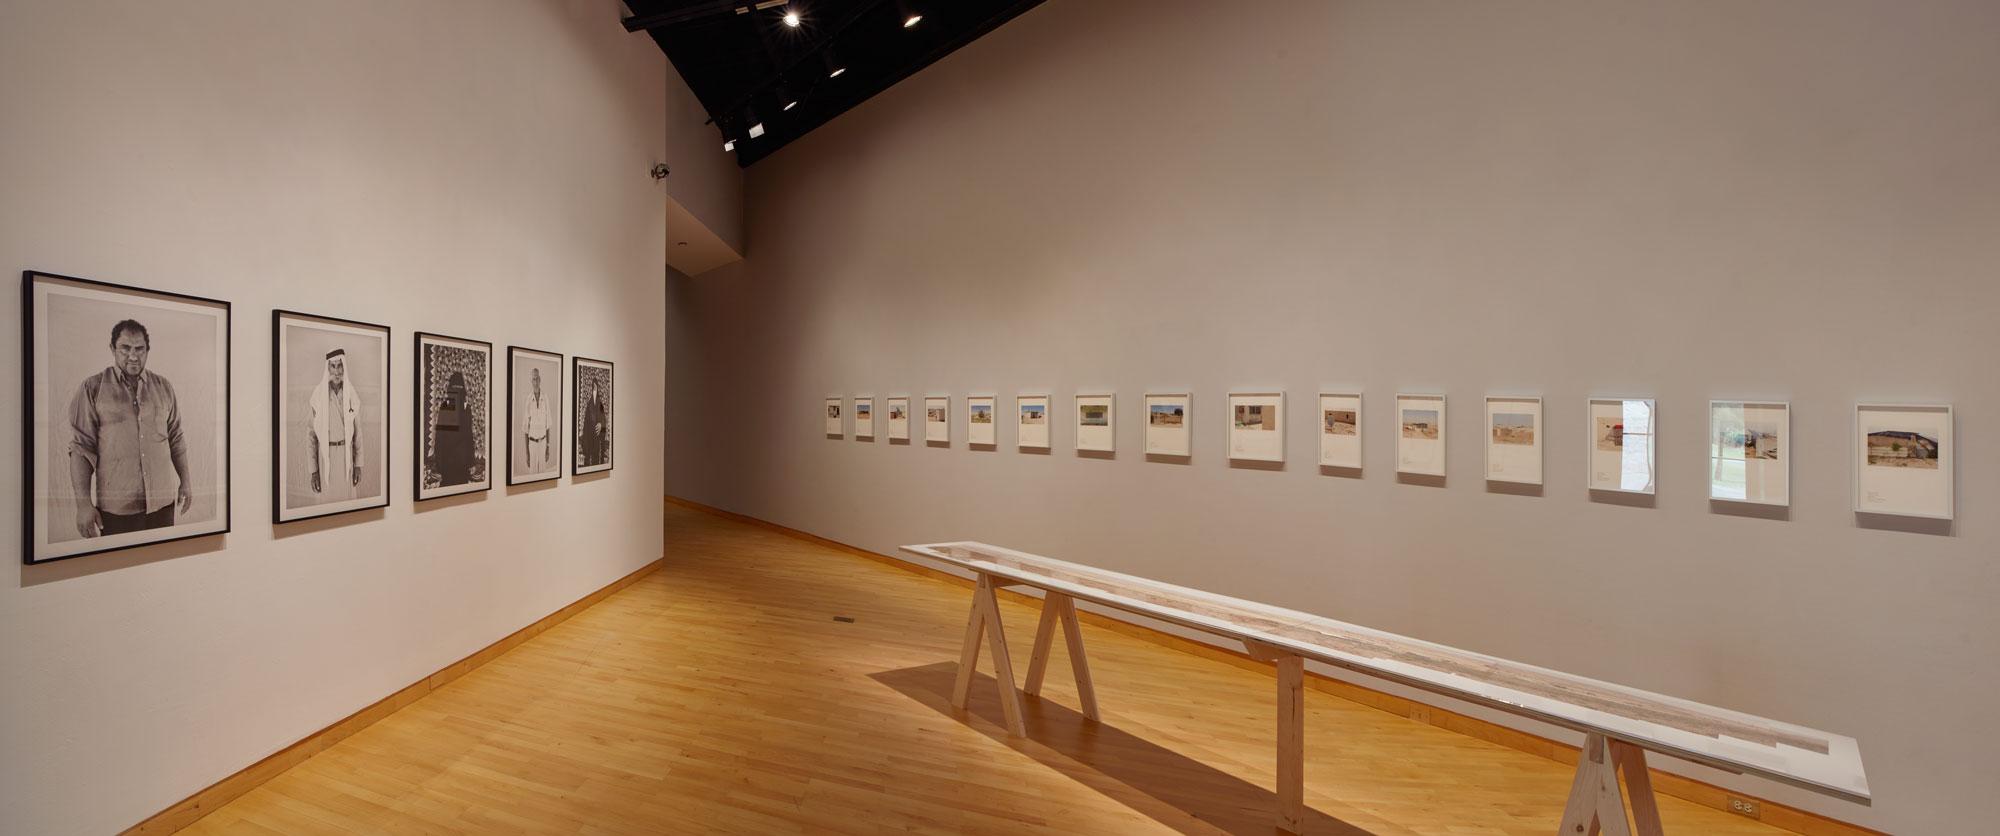 'Miki Kratsman: People I Met' at USF Contemporary Art Museum